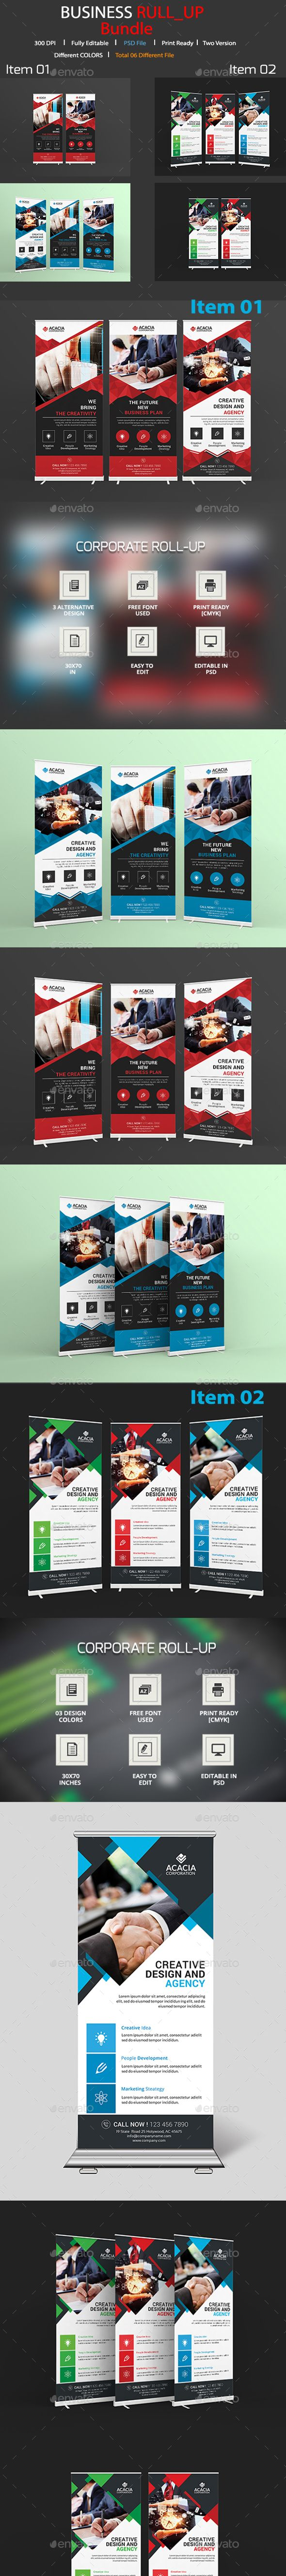 Roll-Up Banner Design Template Bundle - Signage Print Template PSD. Download her...